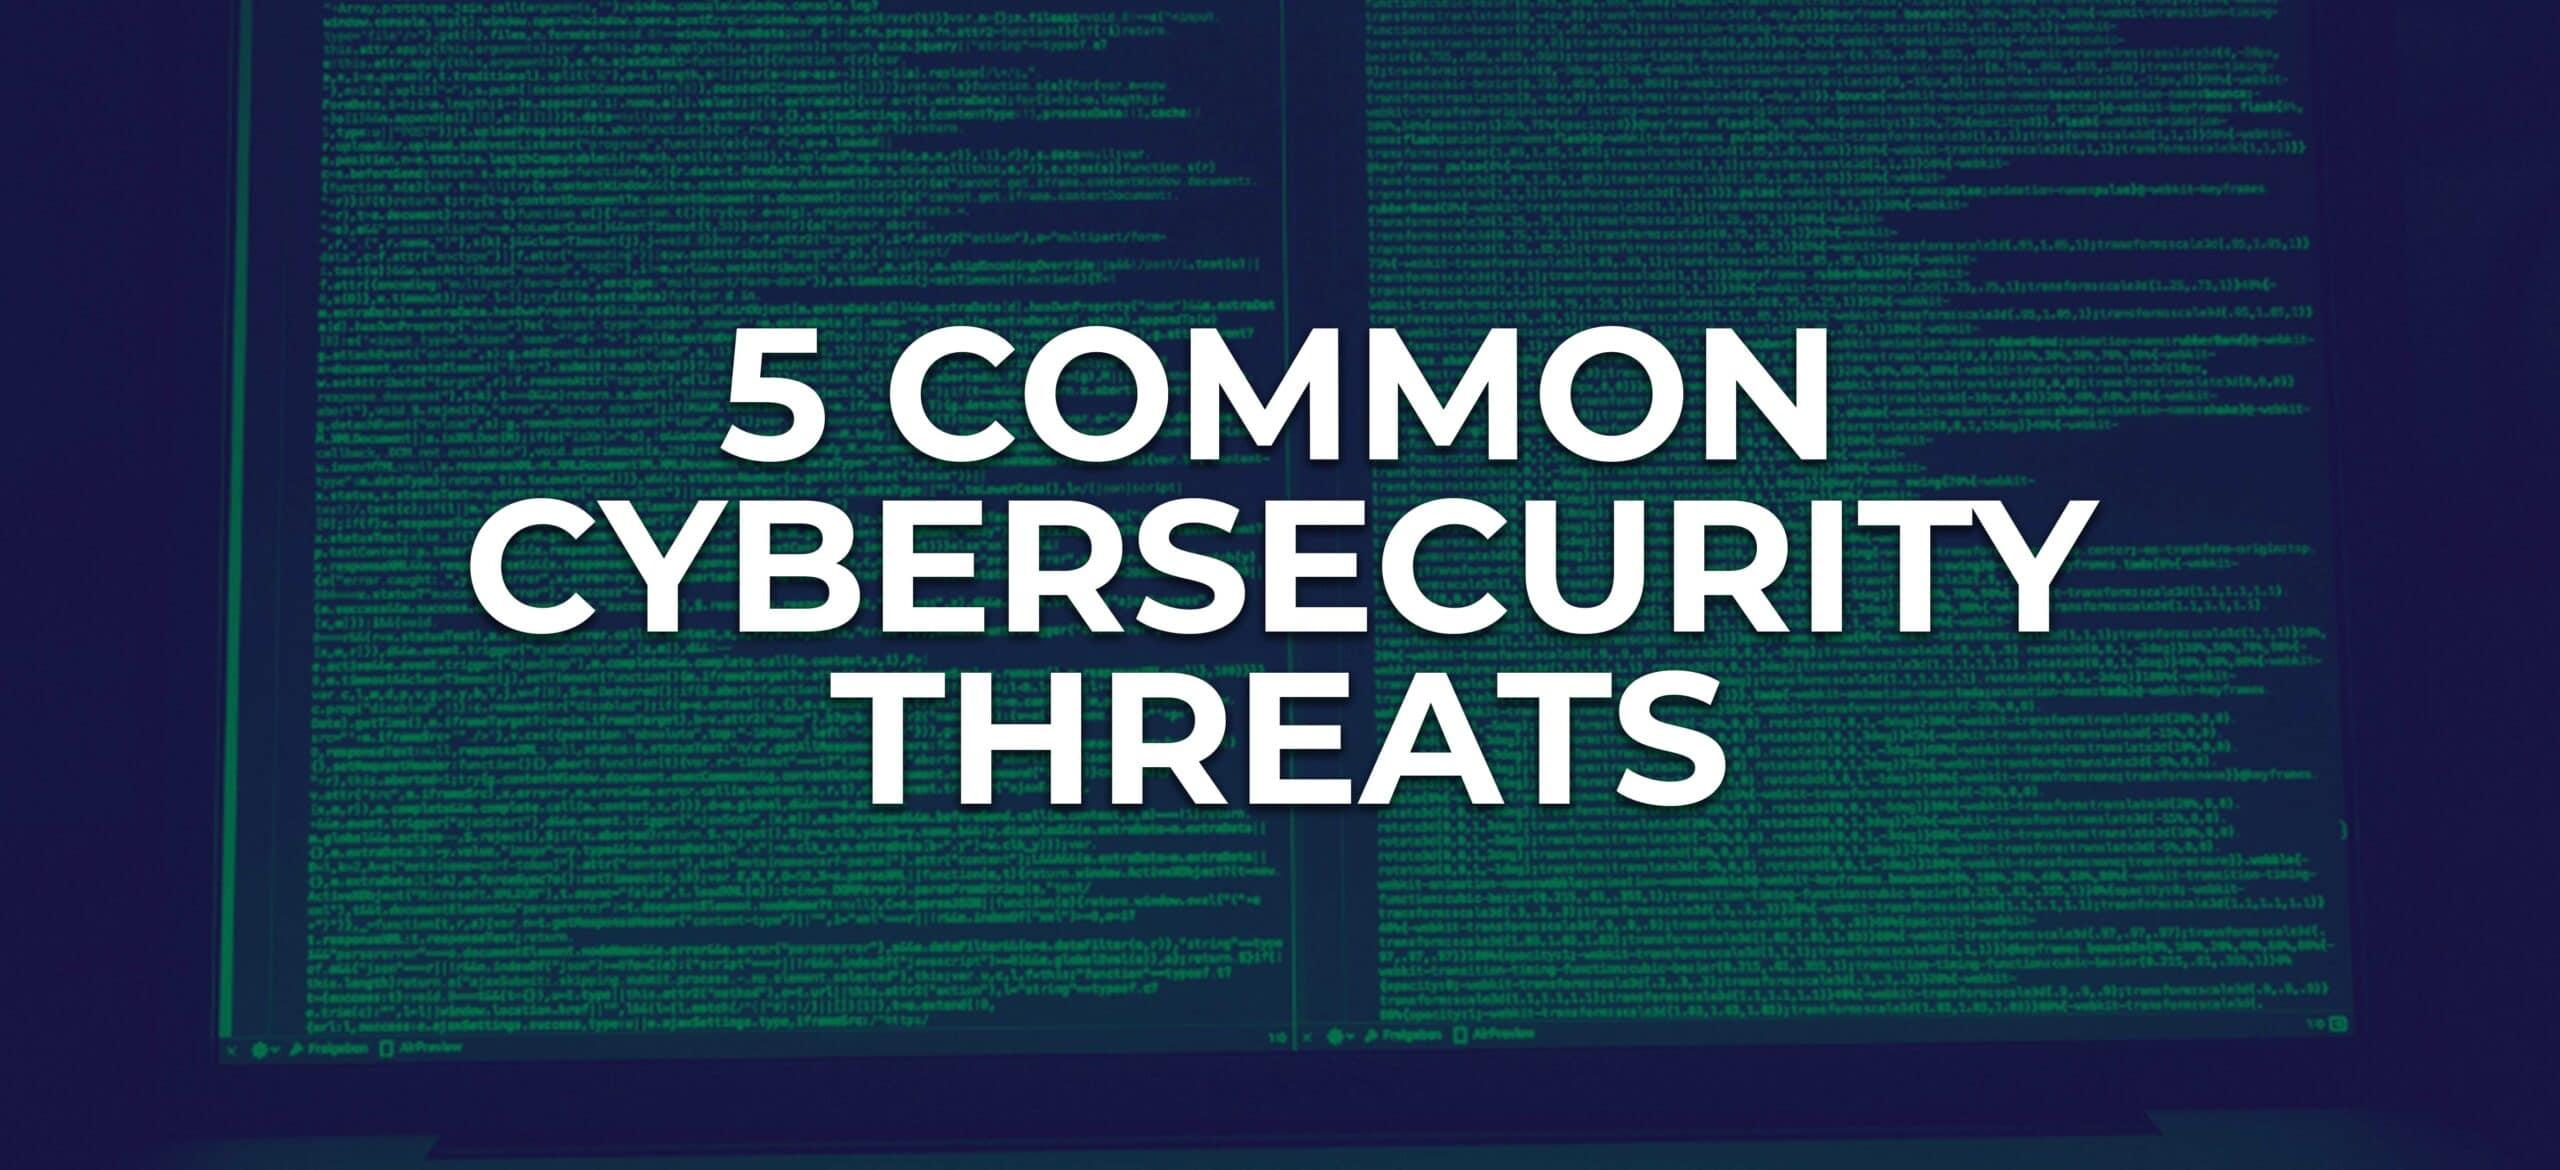 common cybersecurity threats nyc